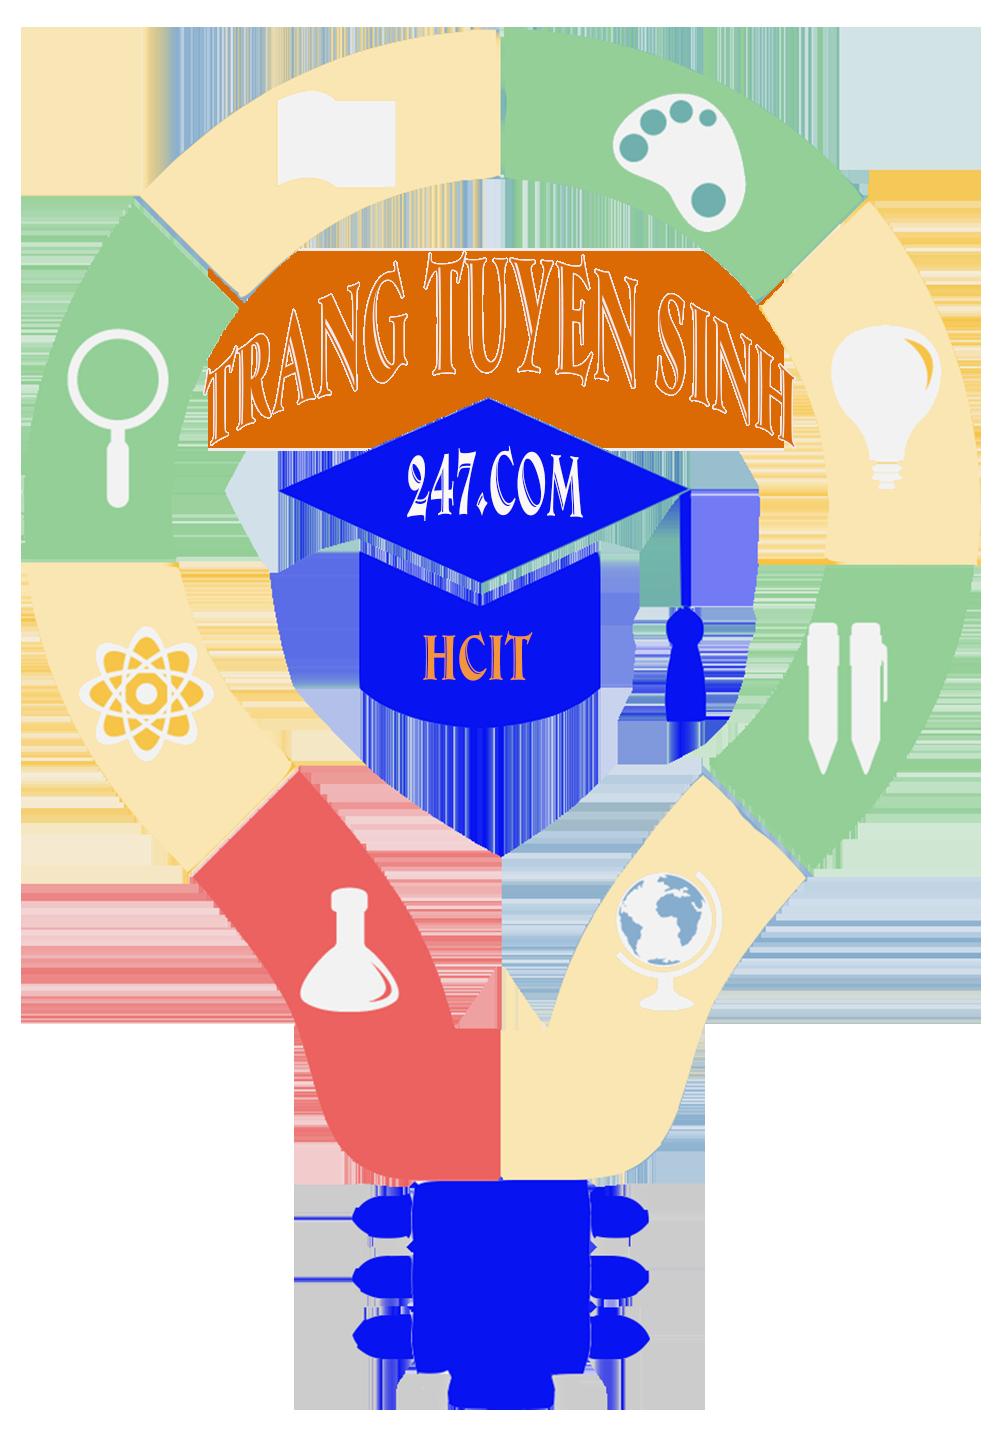 logo trang tuyen sinh 4